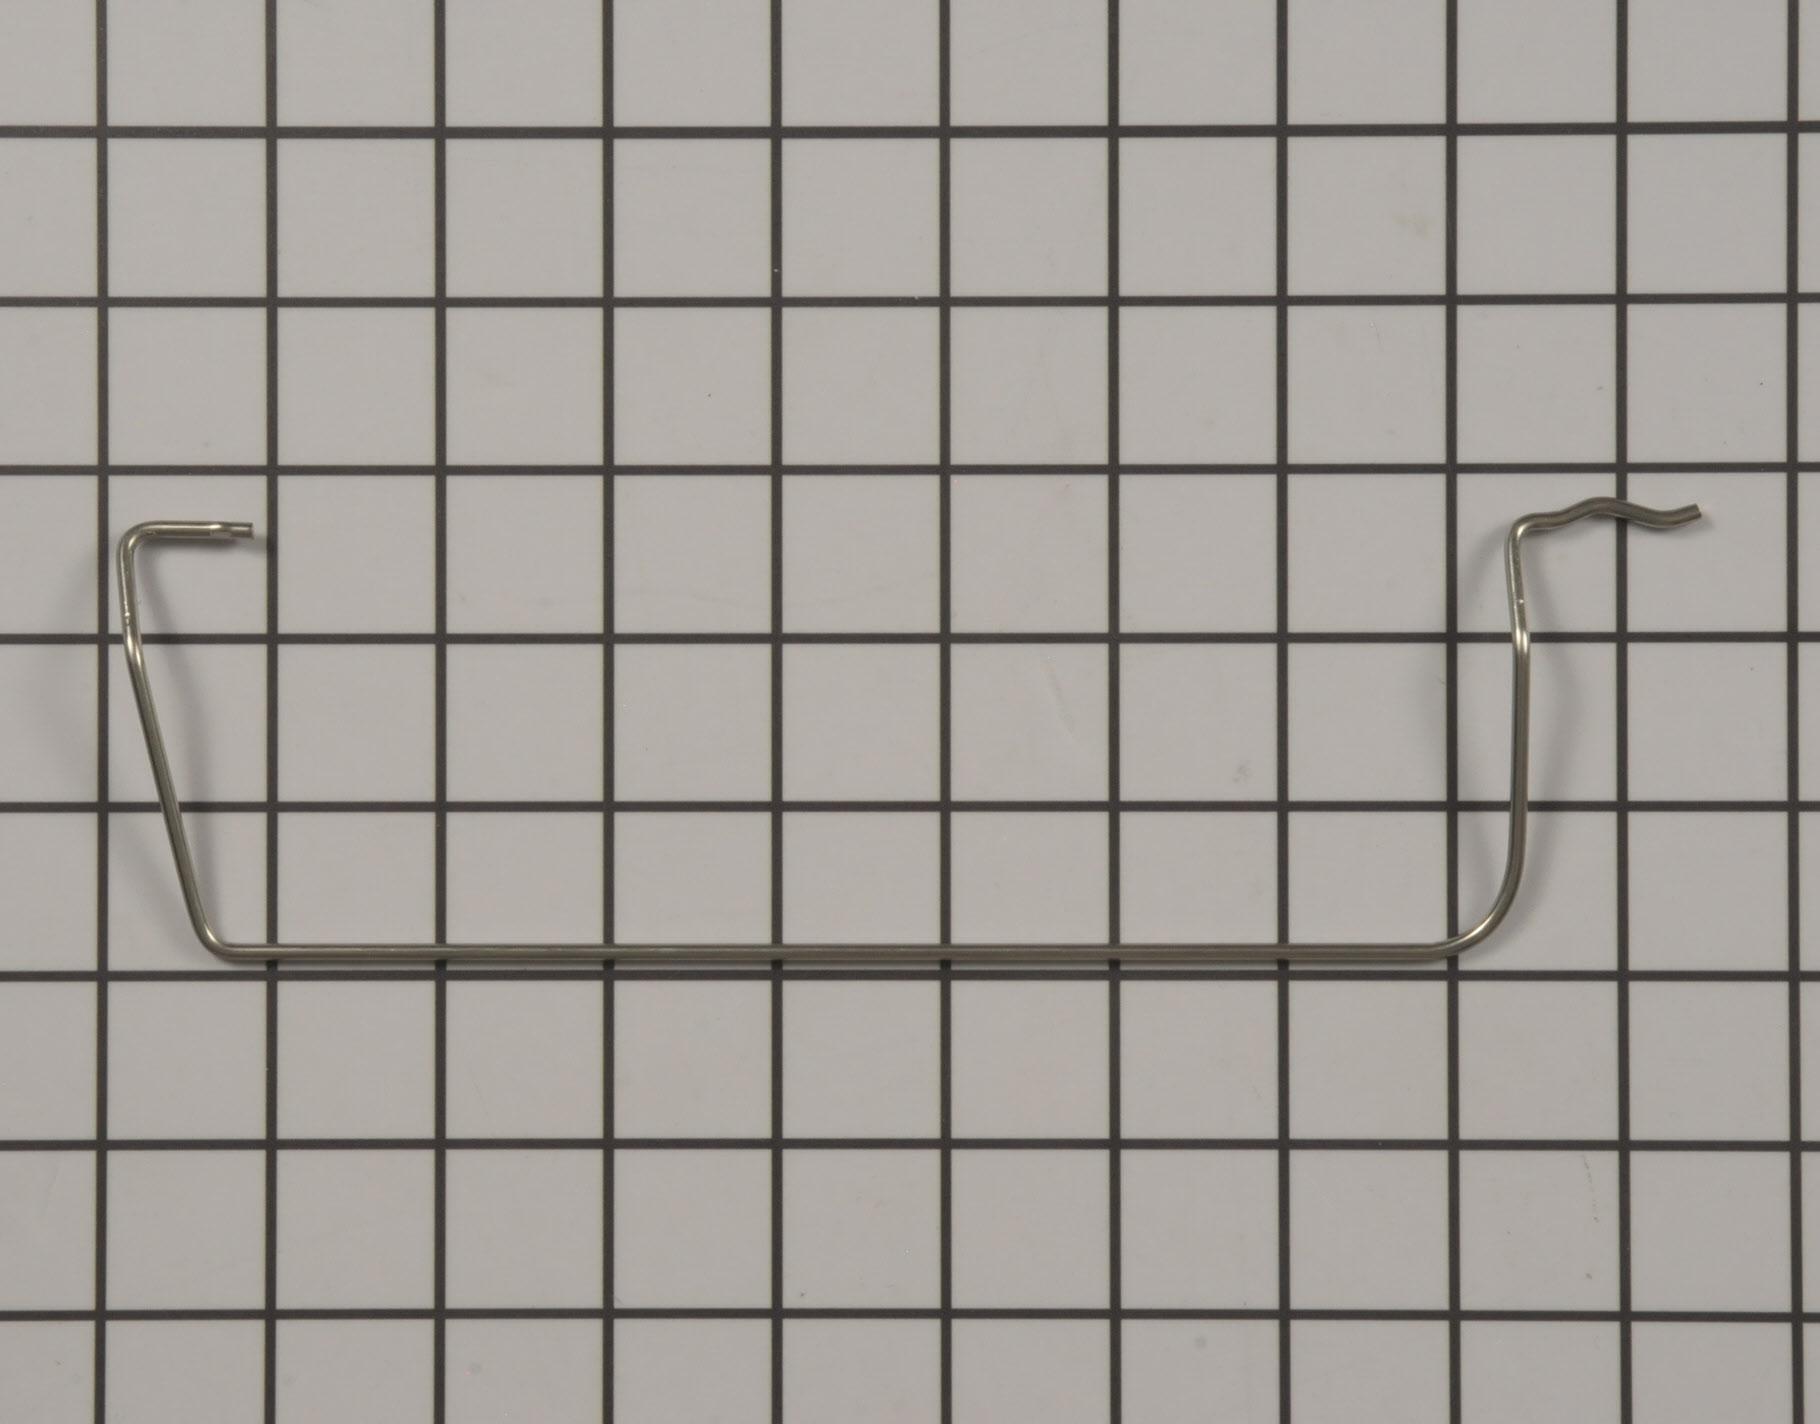 Whirlpool Refrigerator Part # WPW10378254 - Ice Level Arm